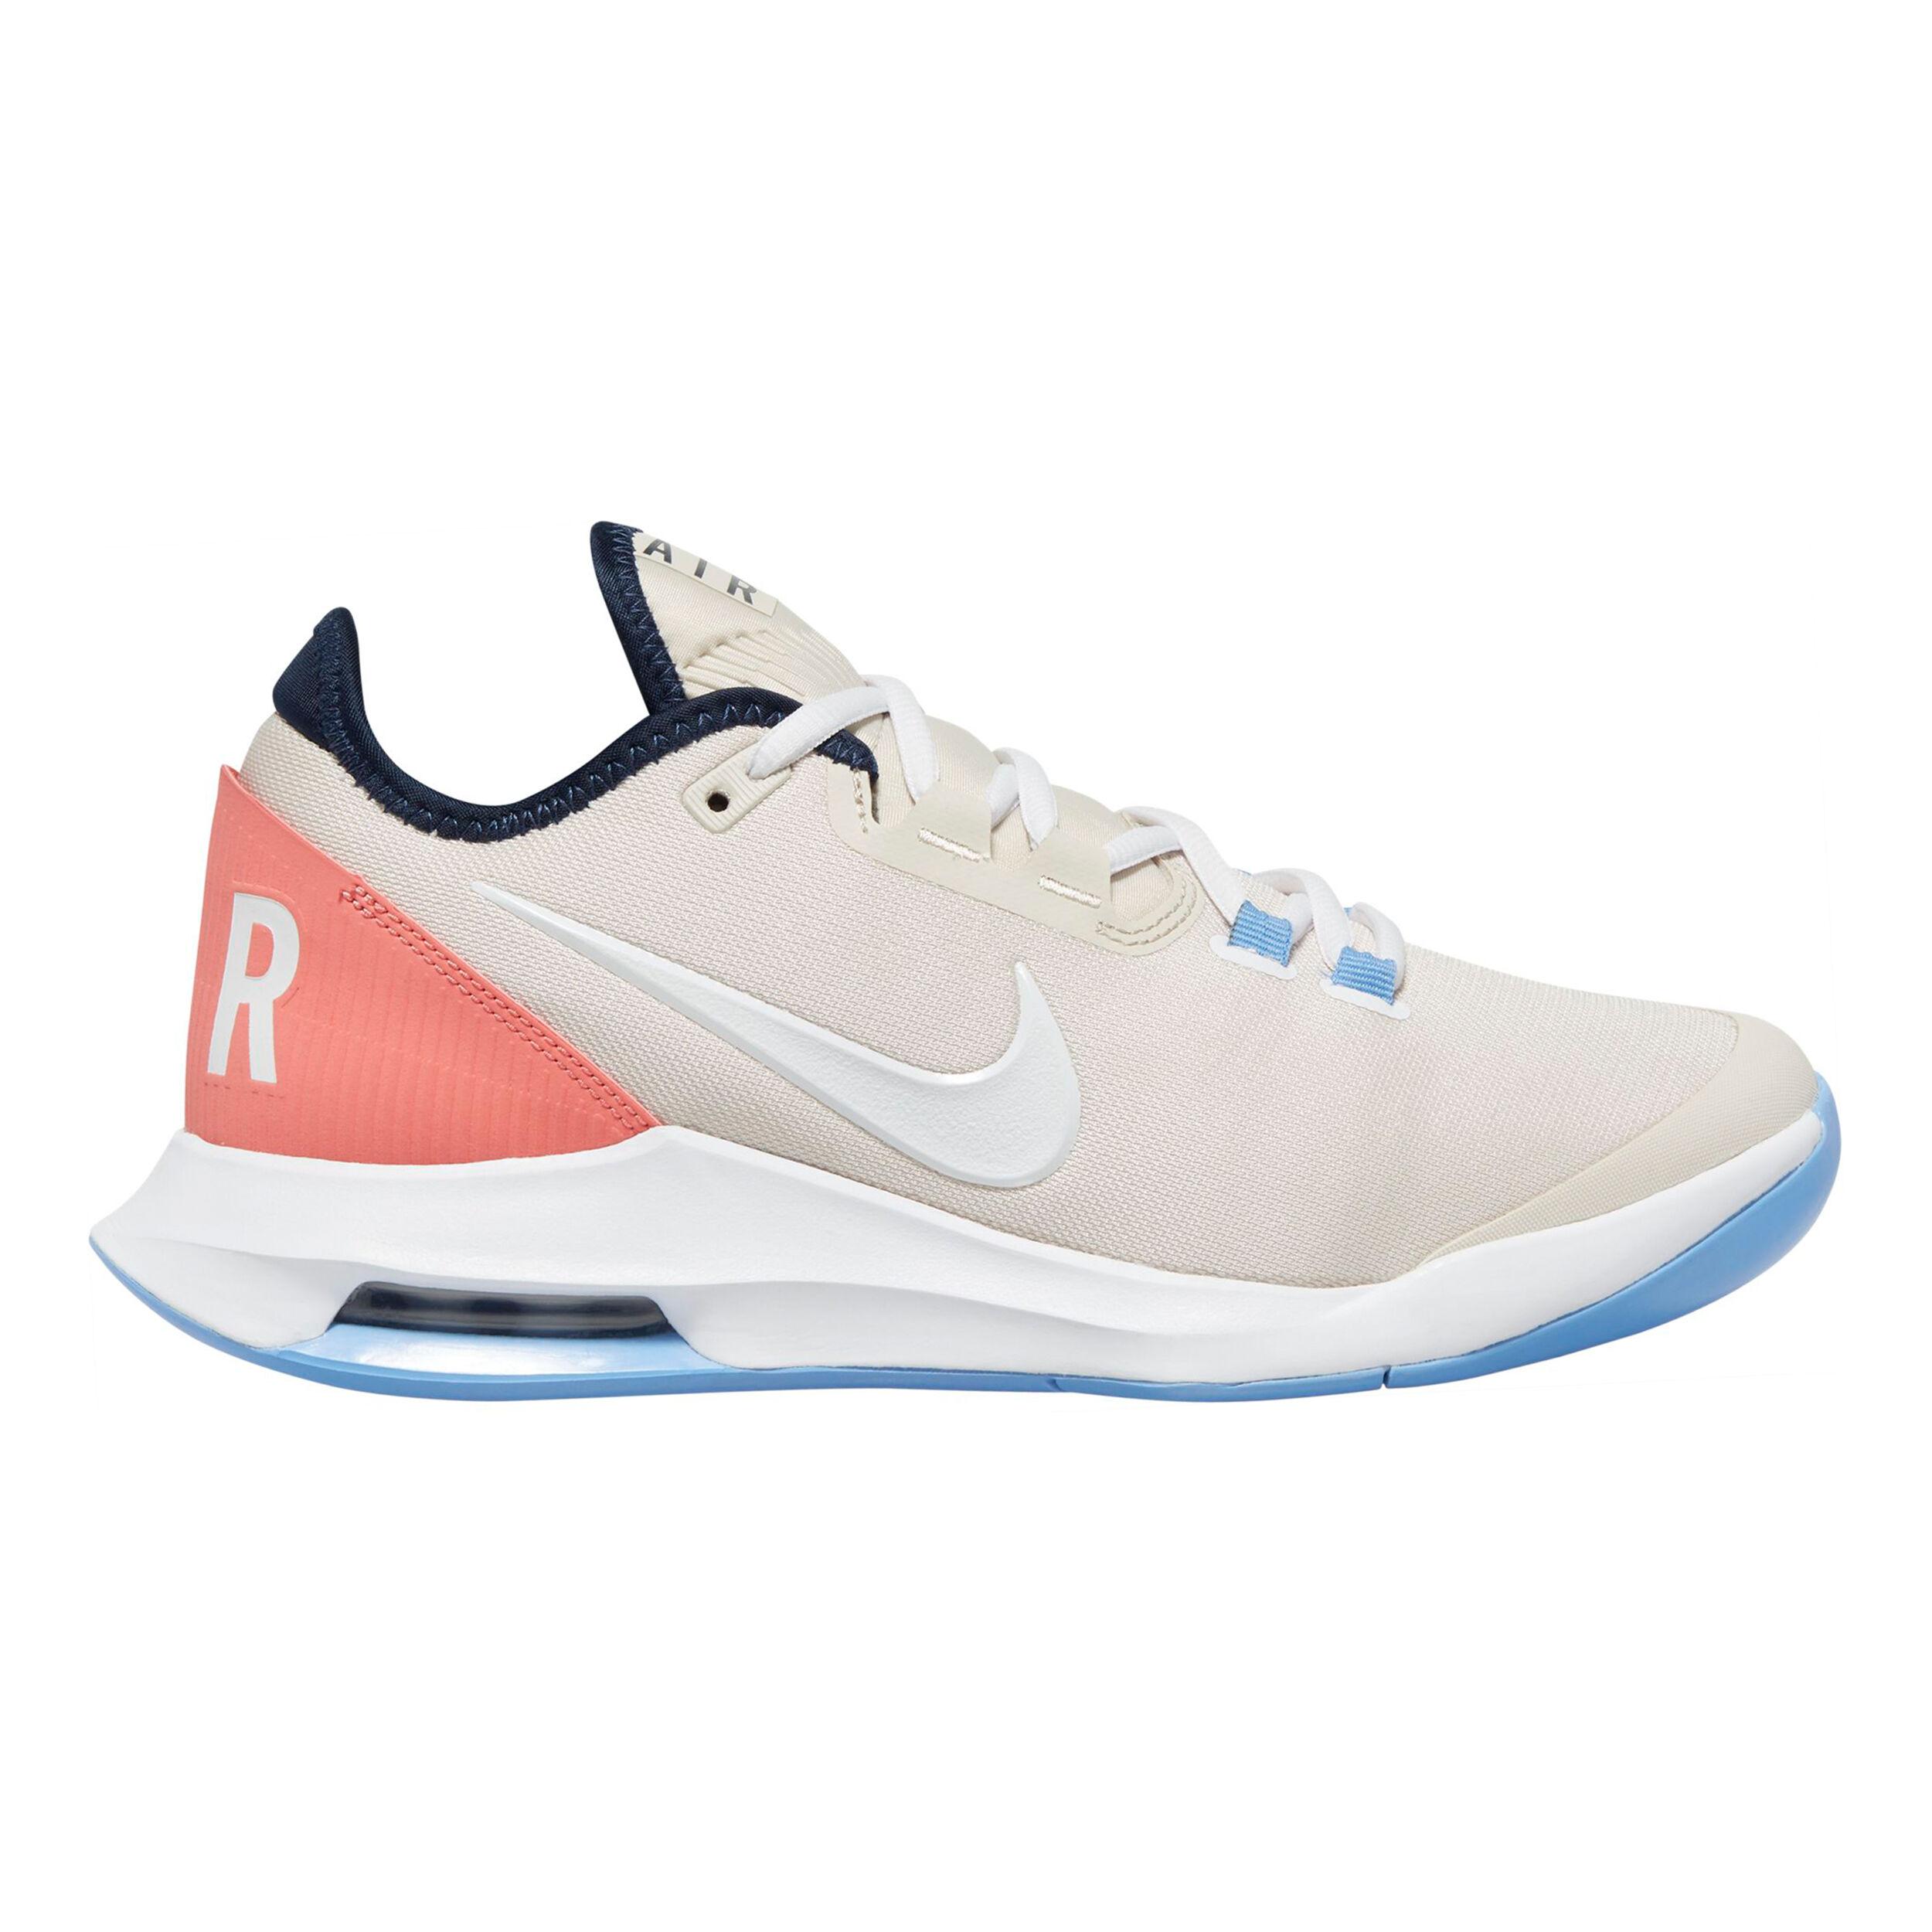 Nike Air Max Wildcard Allroundsko Damer Creme, Korall